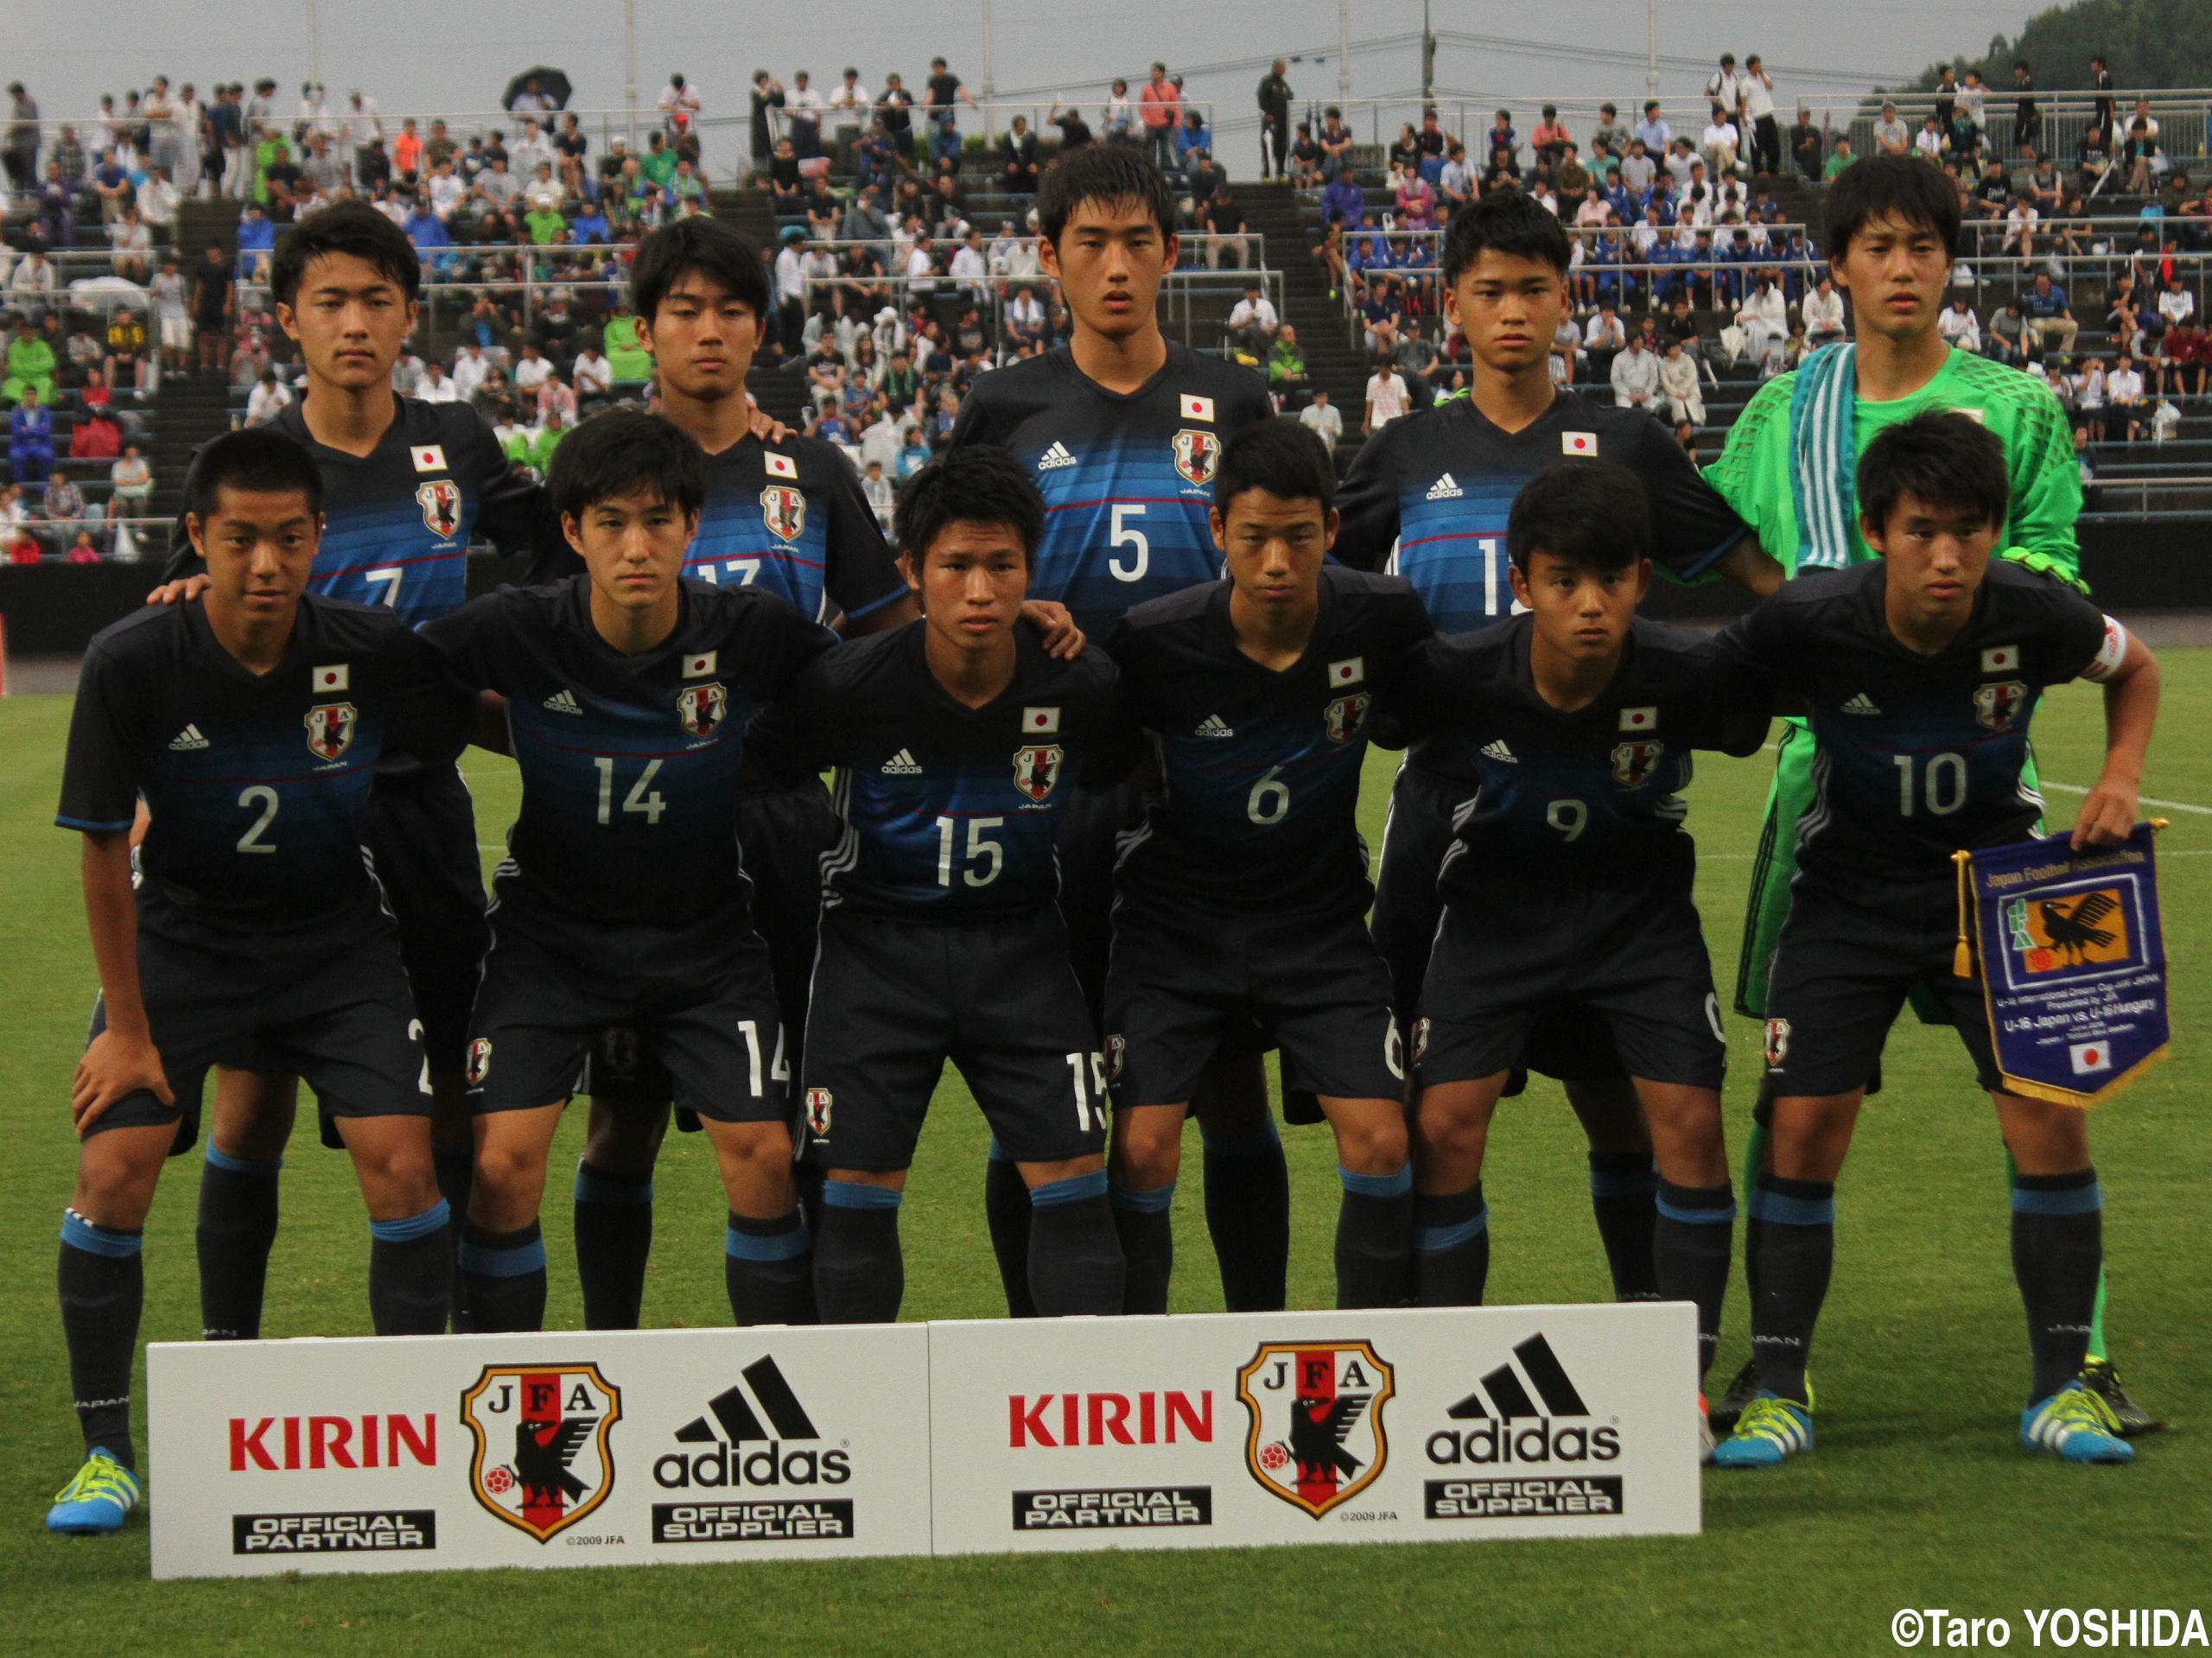 [U-16インターナショナルドリームカップ]U-16日本代表がハンガリーに4発快勝(16枚)